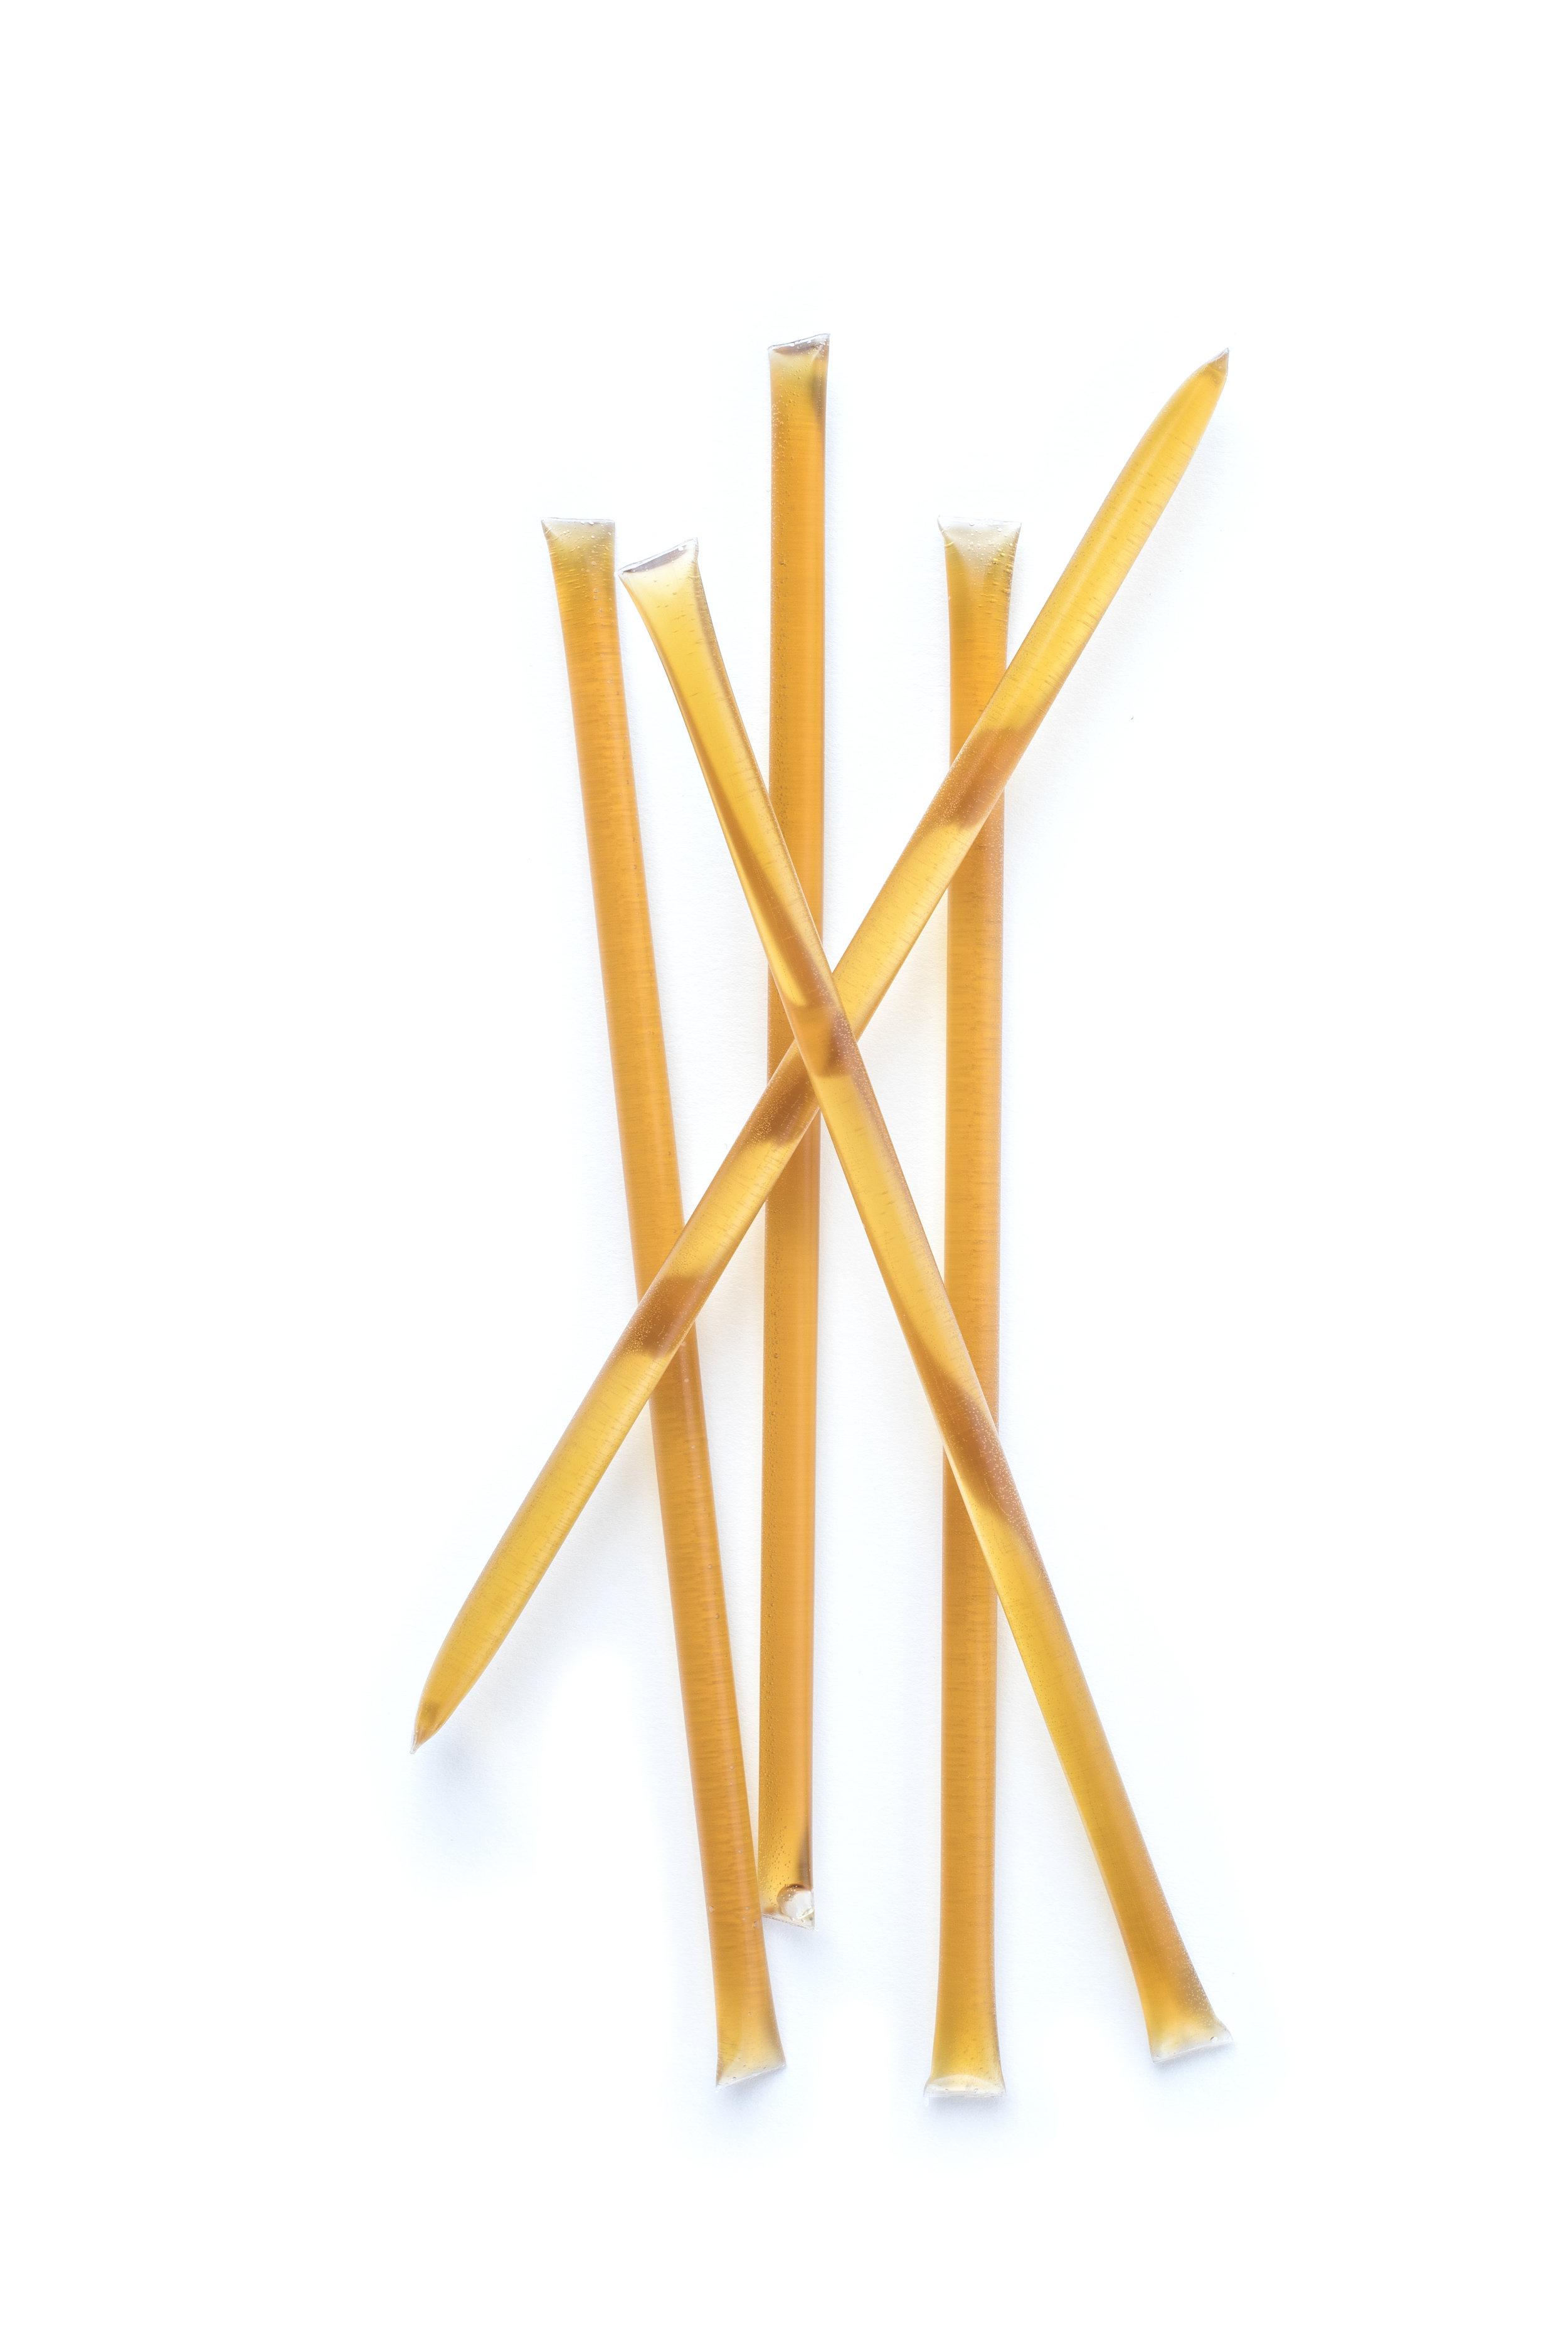 Loose Sticks 5.jpg